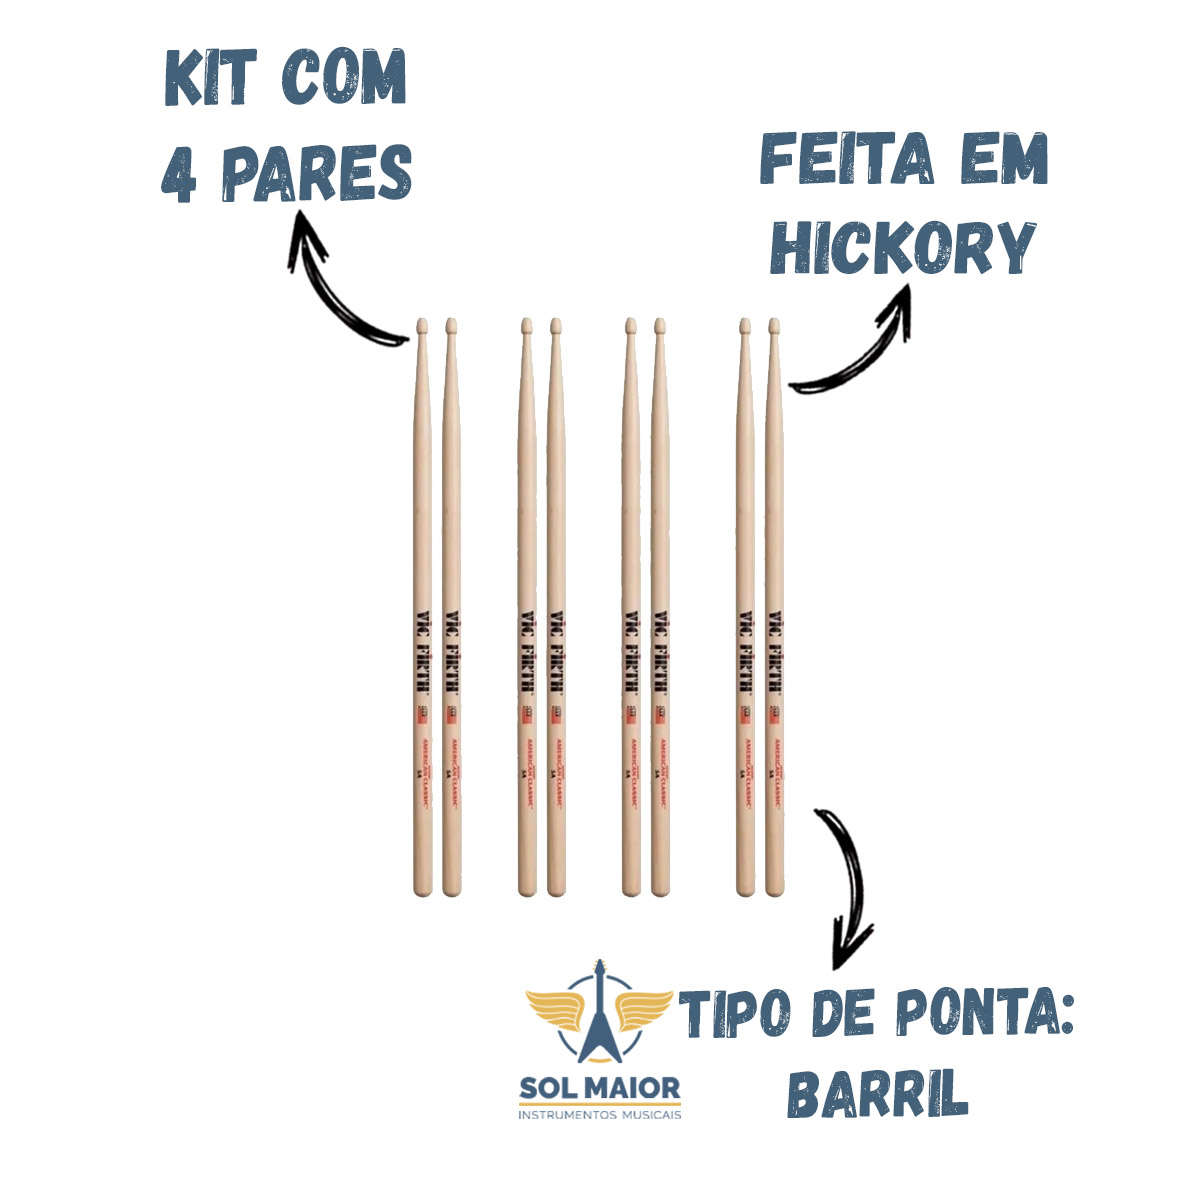 Kit De Baquetas Vic Firth American Classic Hickory 5a 4 pares